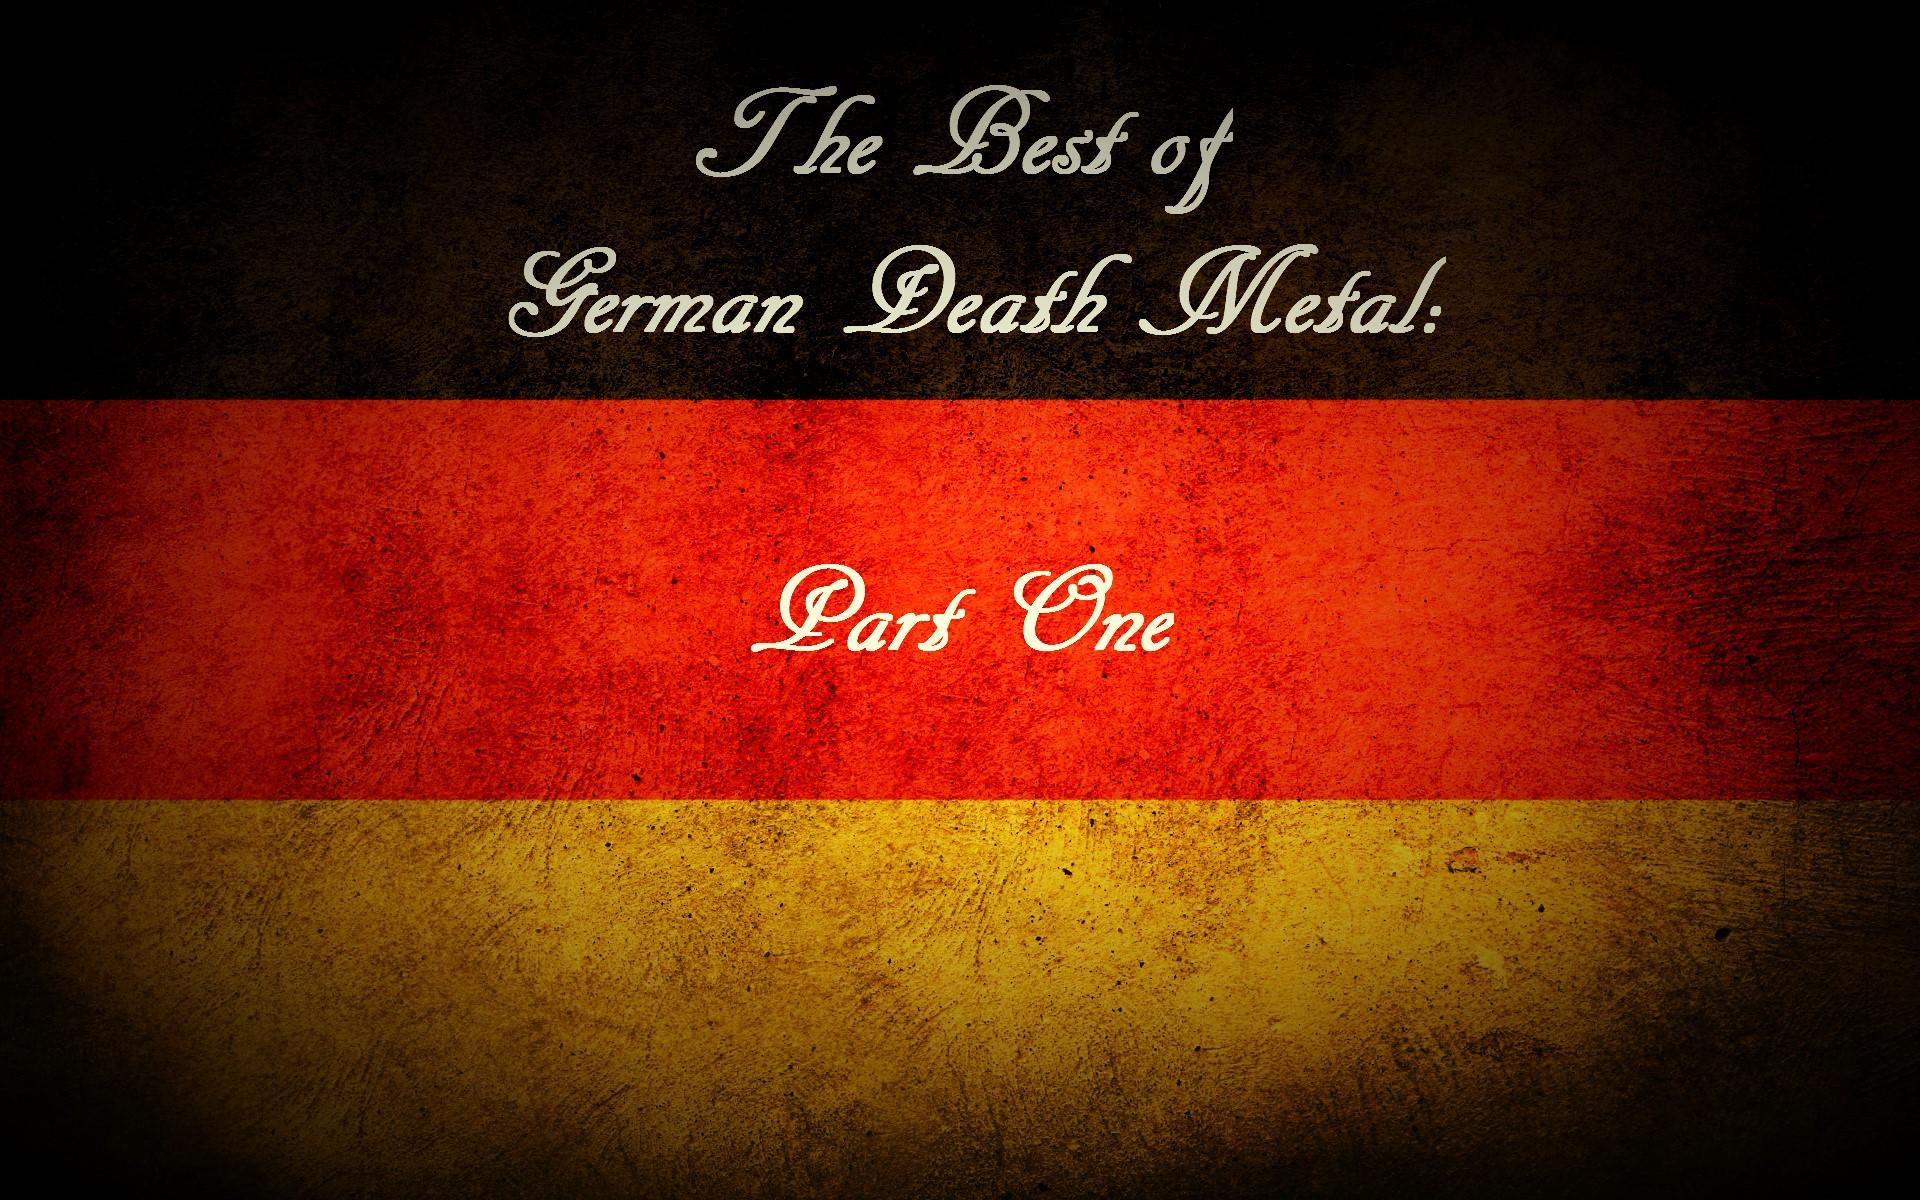 The Best of German Death Metal – Part One